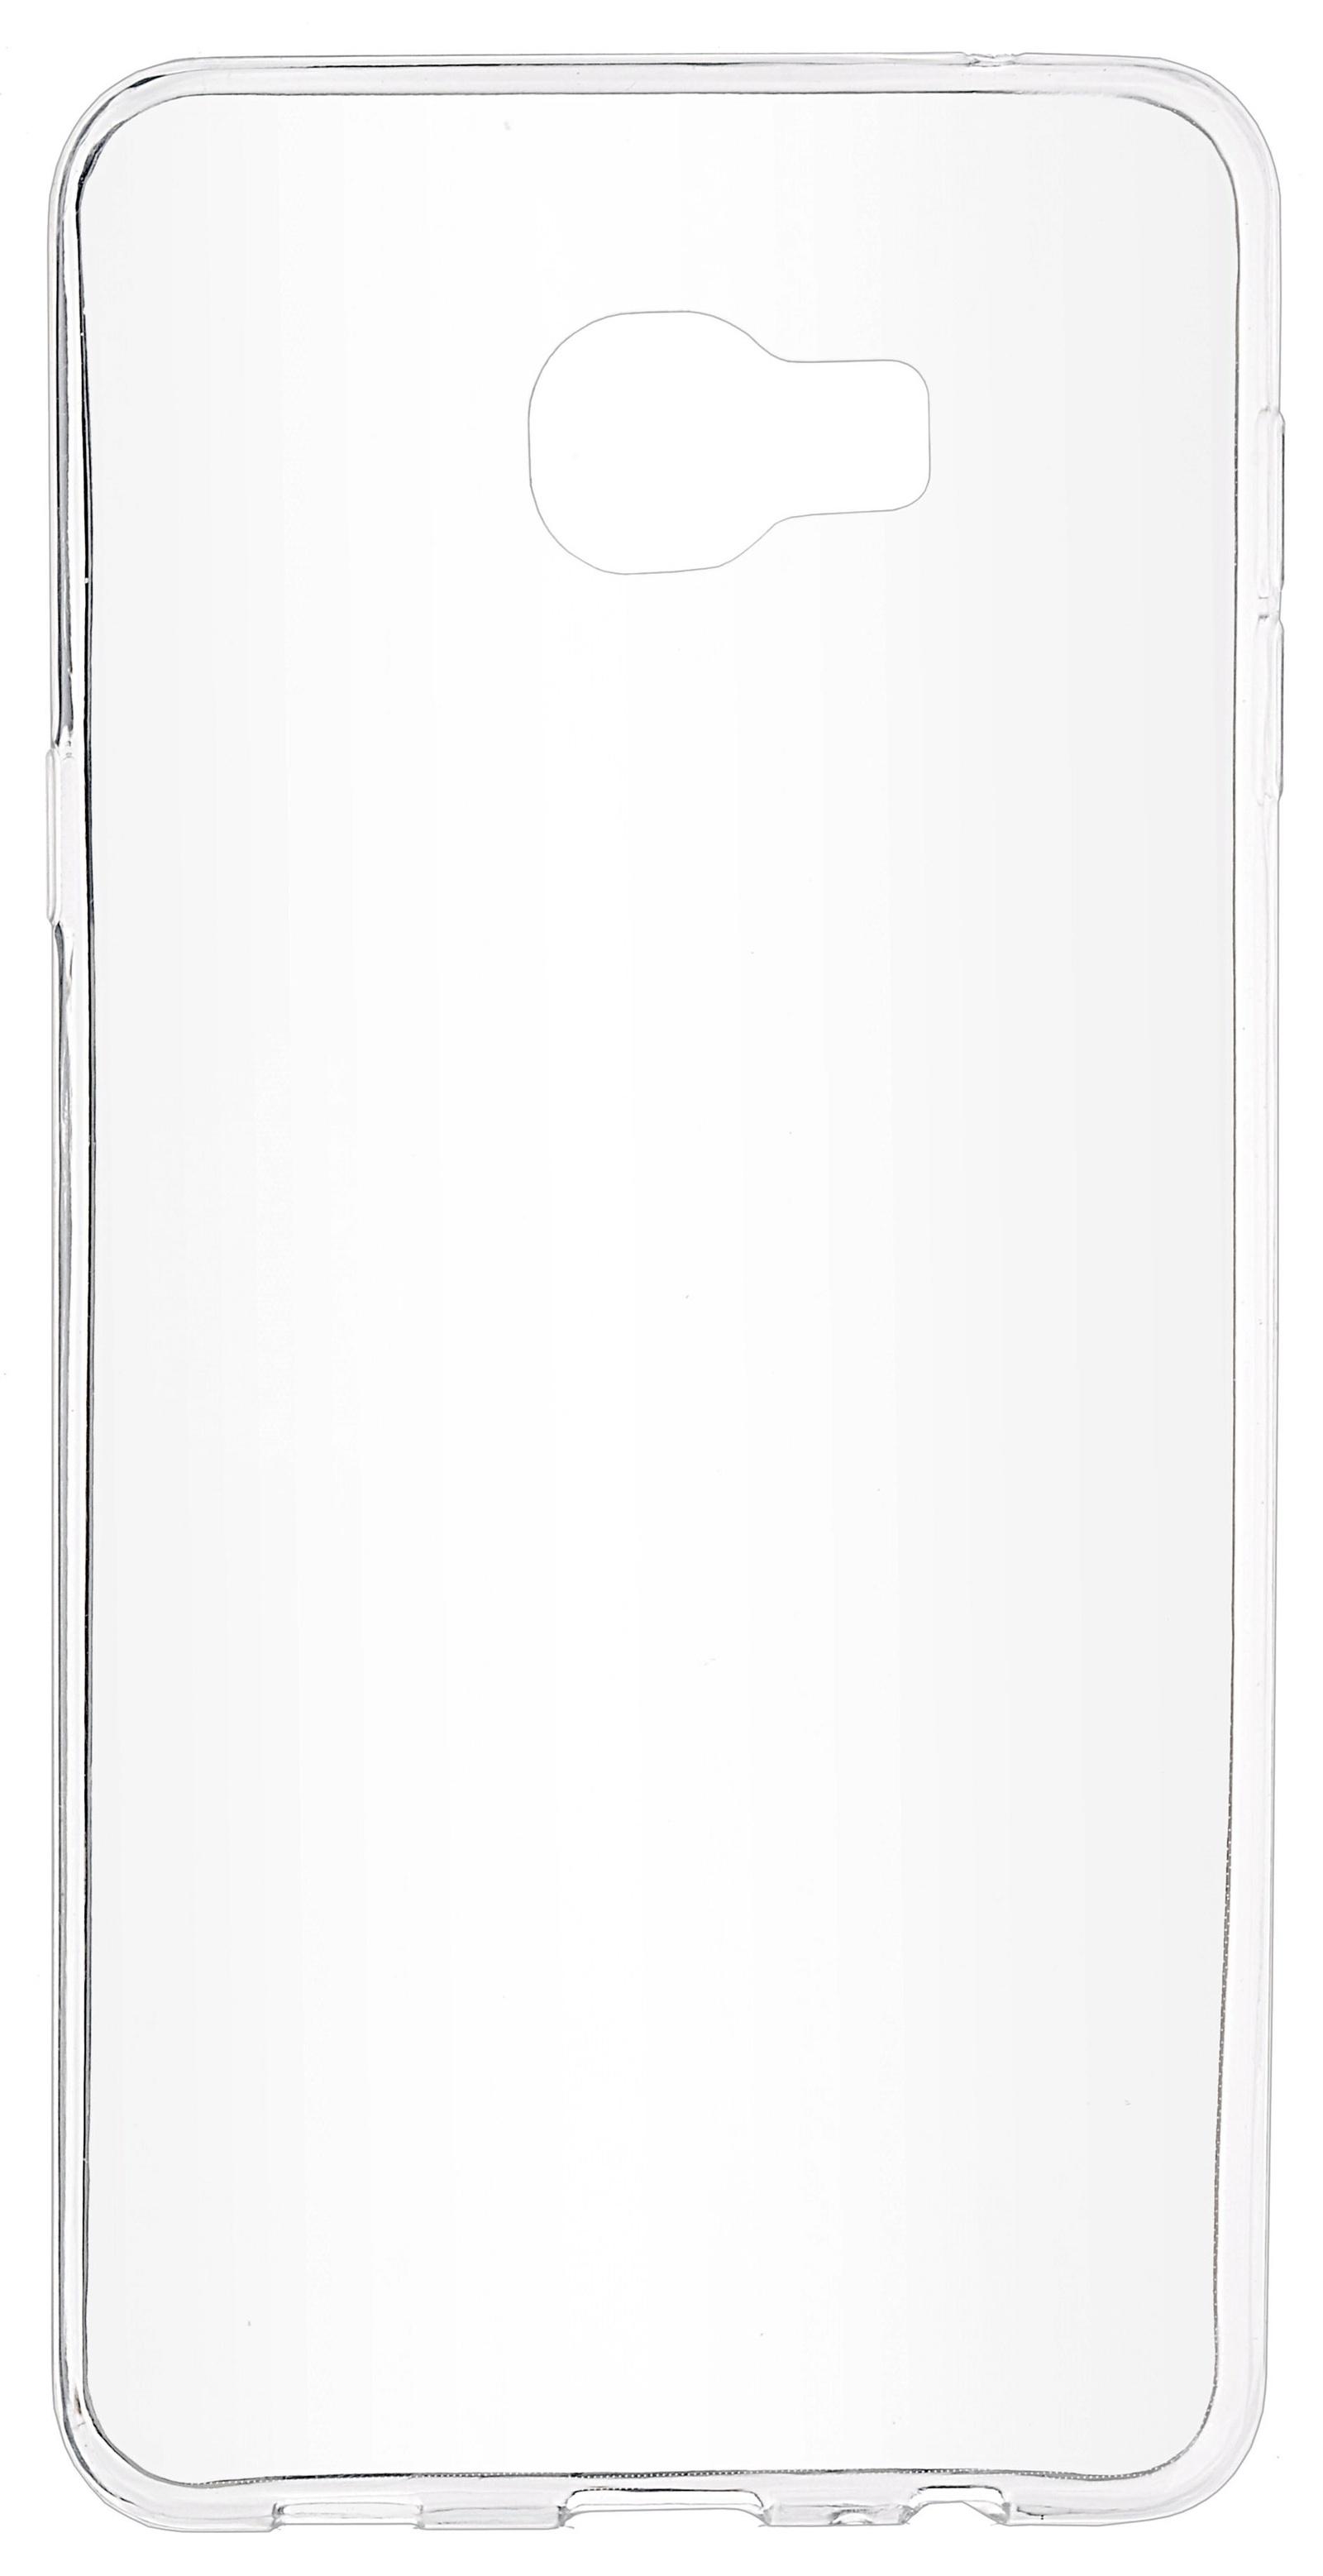 Чехол для сотового телефона skinBOX Slim Silicone, 4630042528895, прозрачный чехол для xiaomi redmi pro skinbox 4people slim silicone case прозрачный